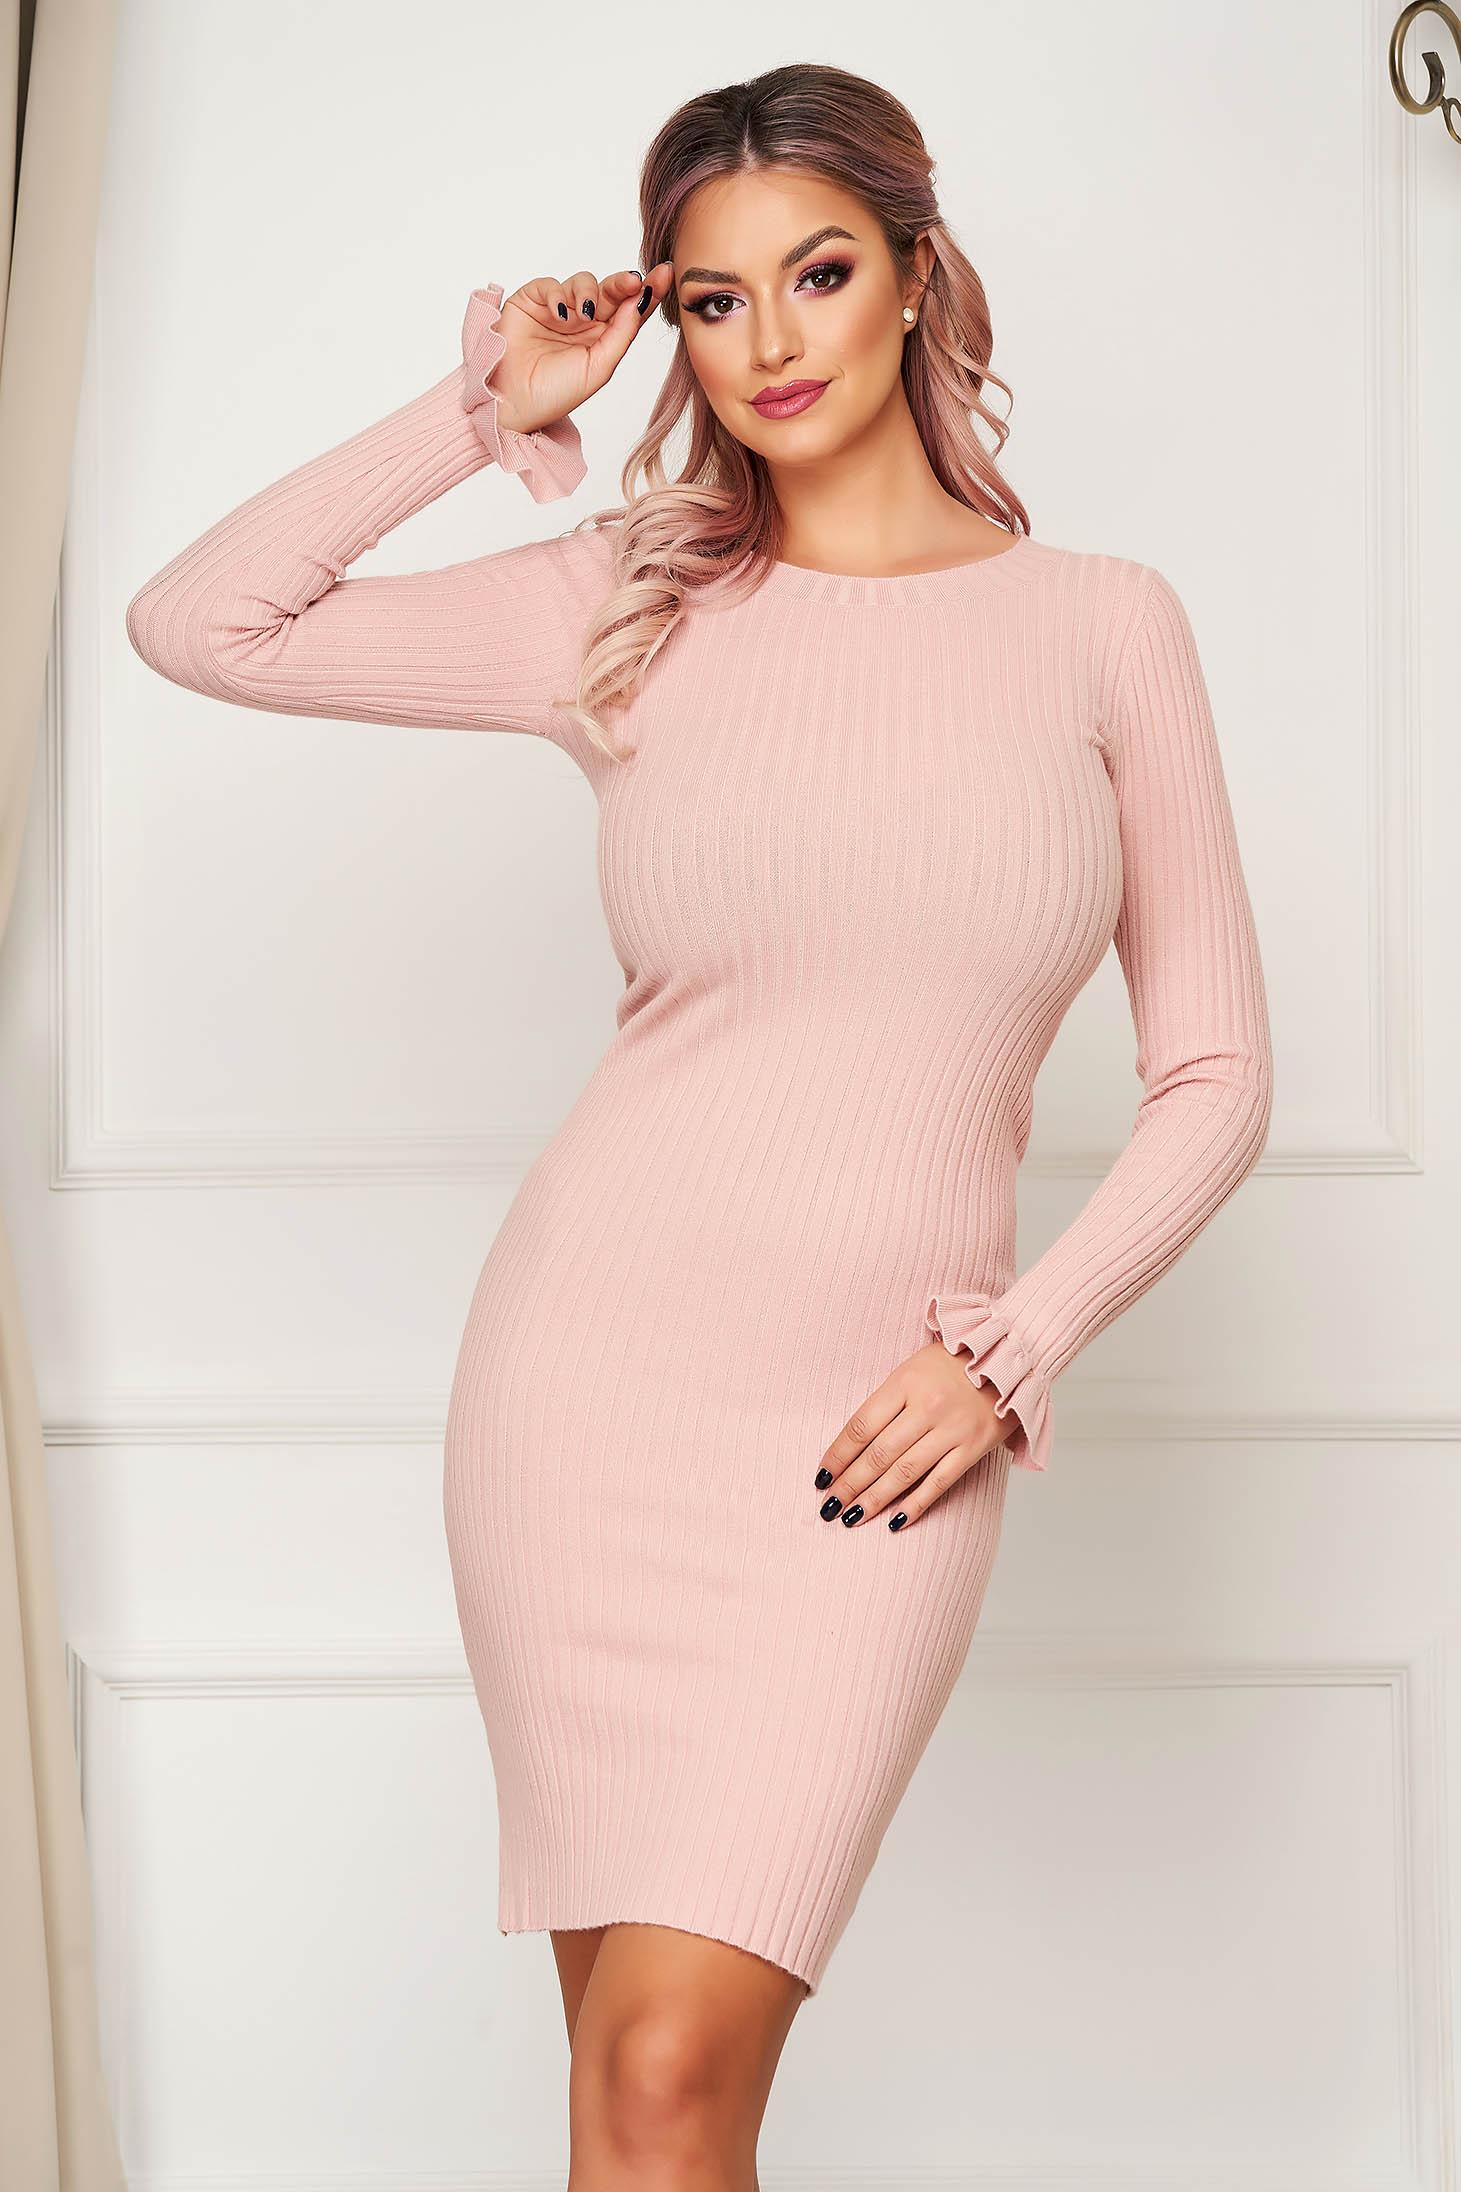 Rochie SunShine roz scurta de zi tip creion tricotata cu volanase la maneca